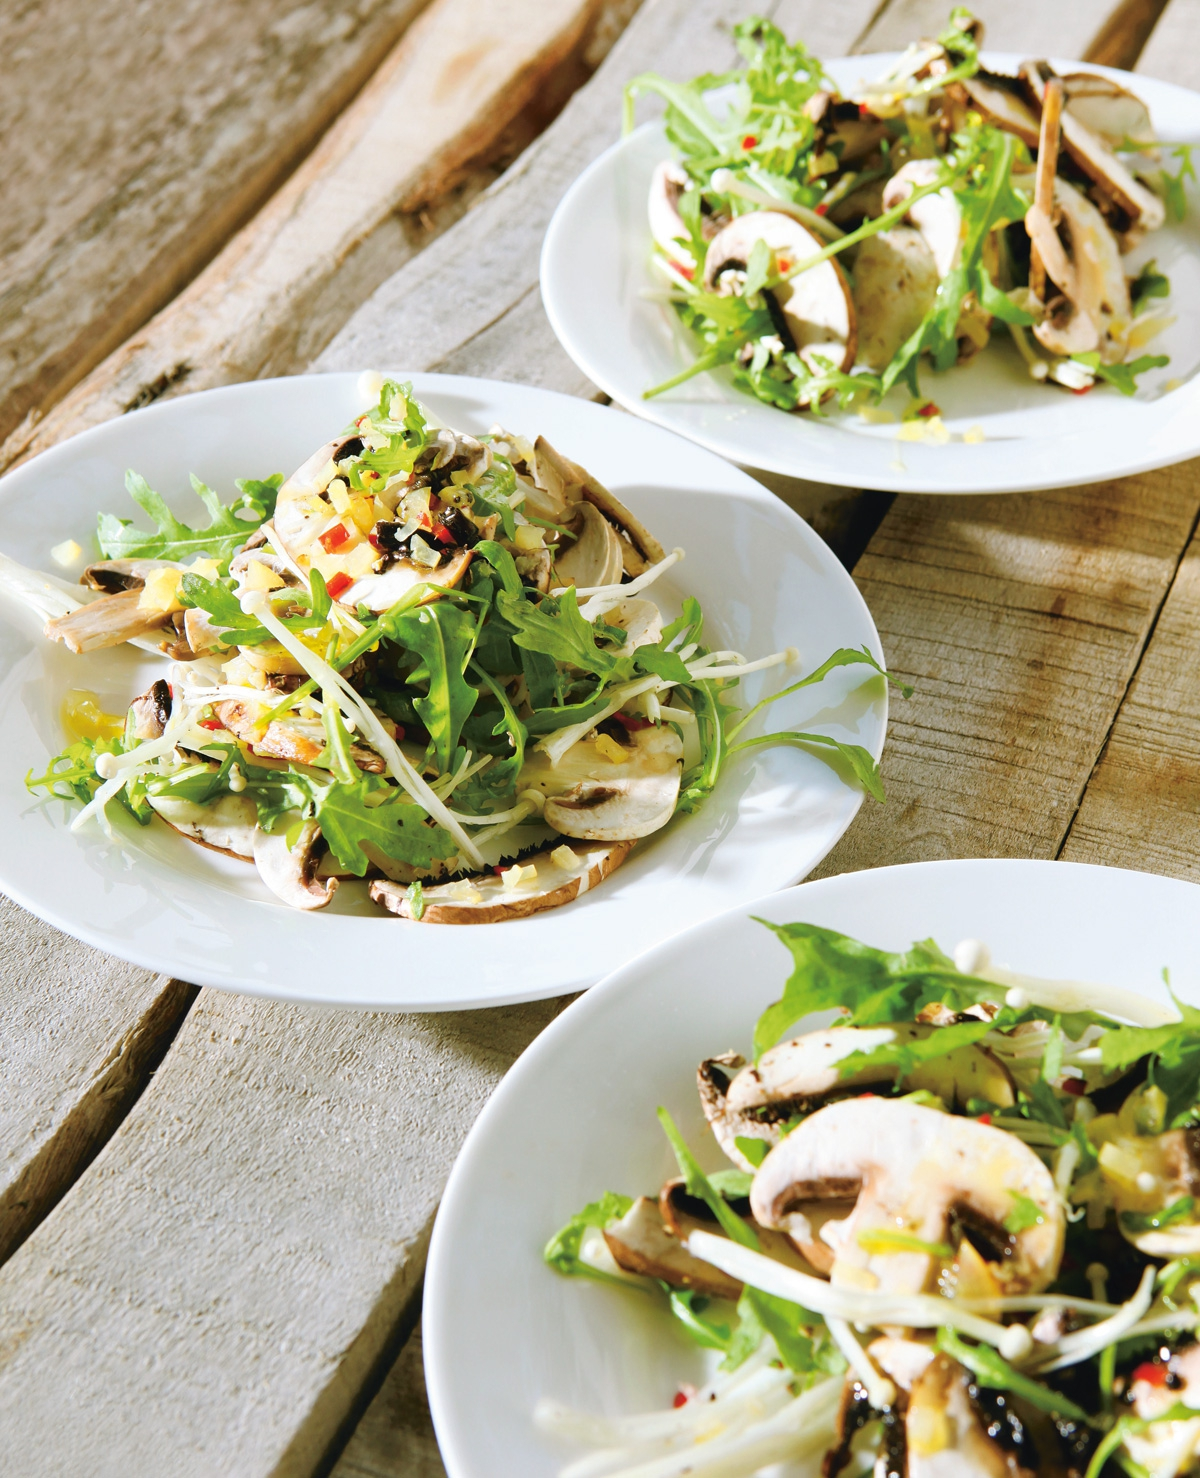 Culi: Rauwe paddenstoelen met chilipeper en ingemaakte citroen